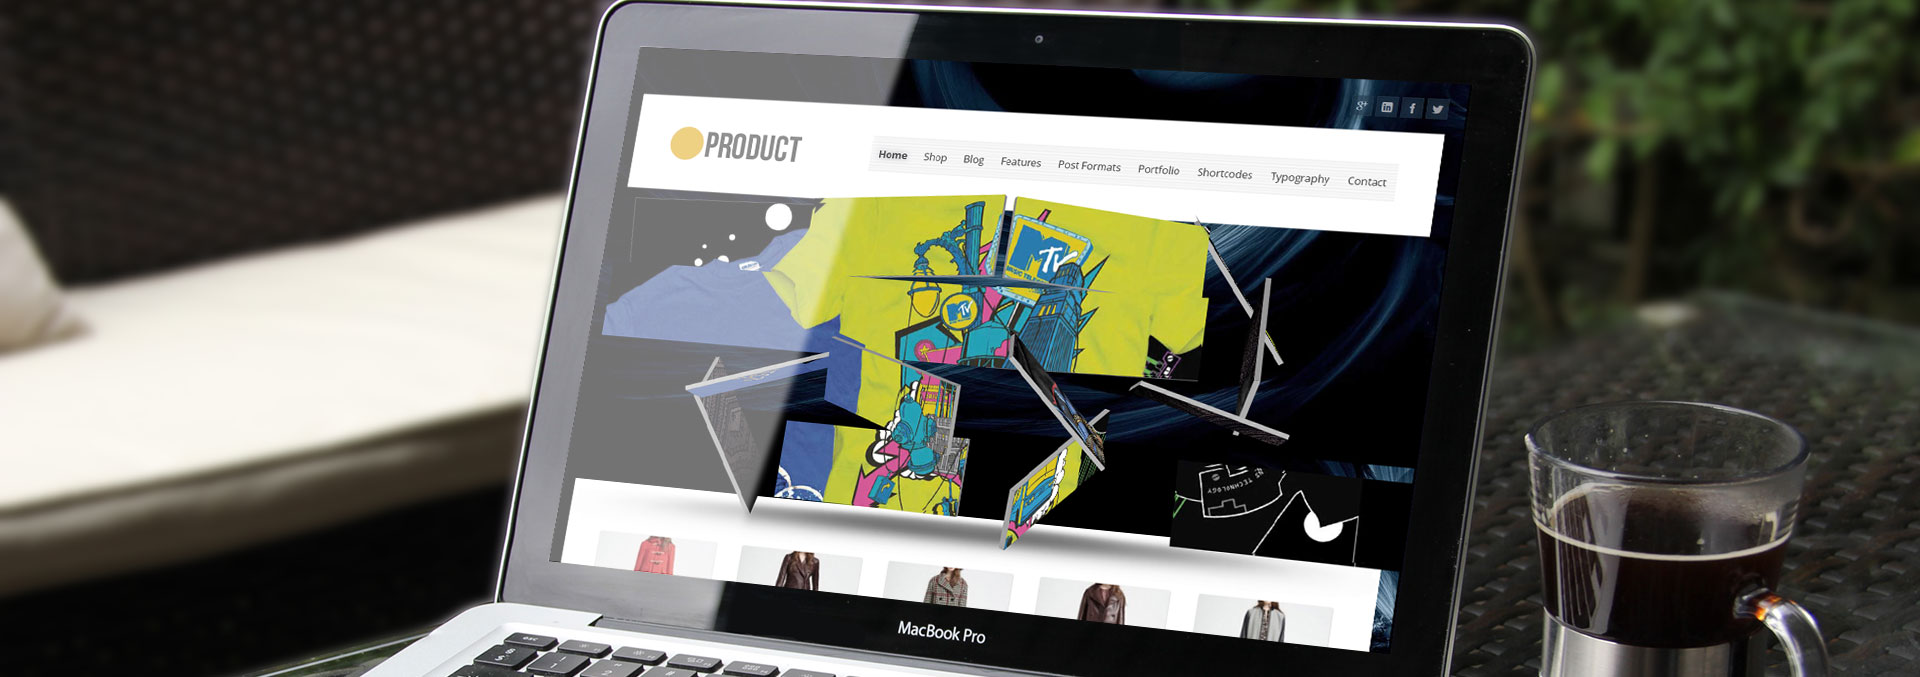 product wordpress theme